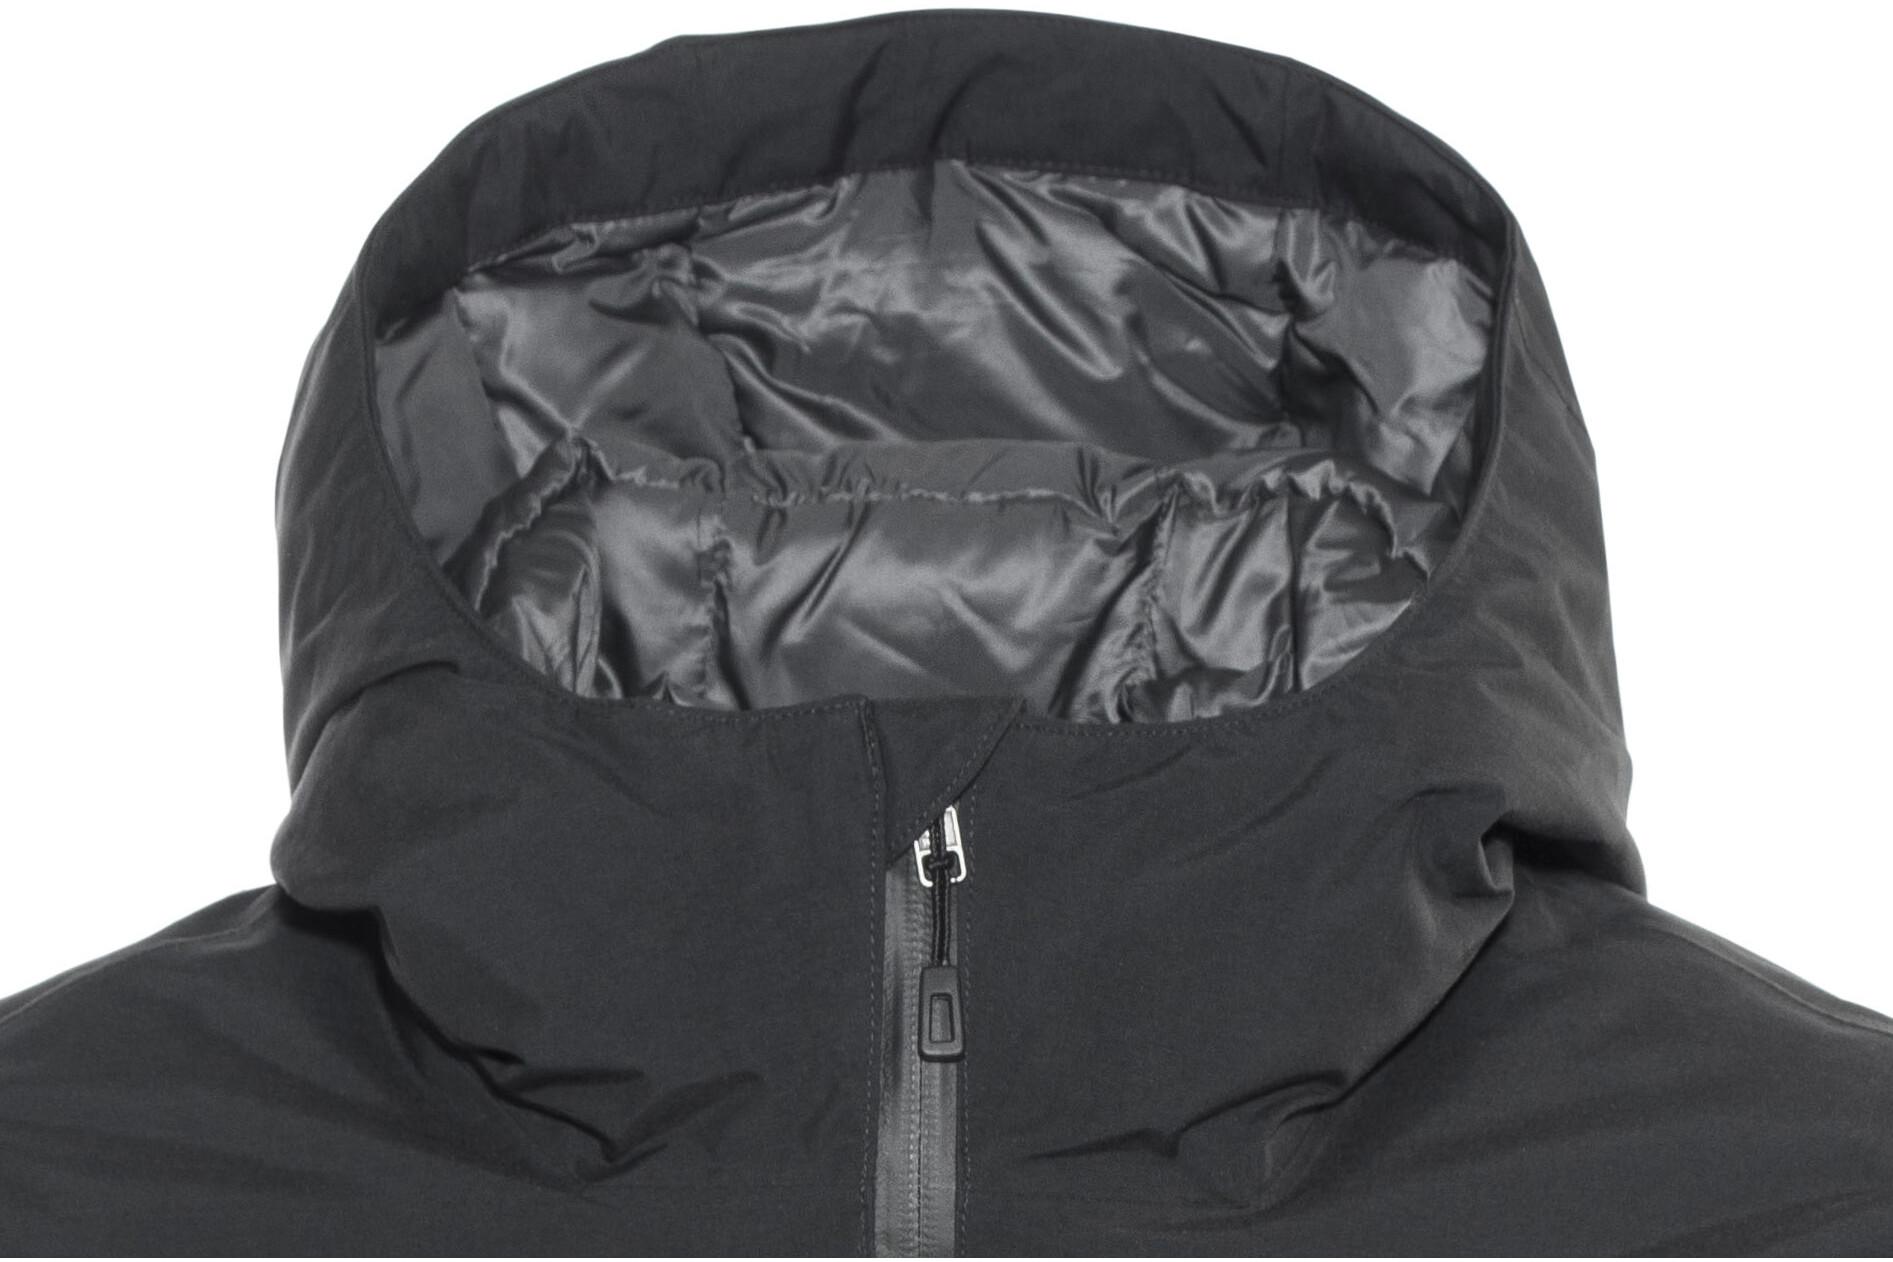 Black Diamond Klettergurt Haltbarkeit : Patagonia windsweep down hoody men black campz.de